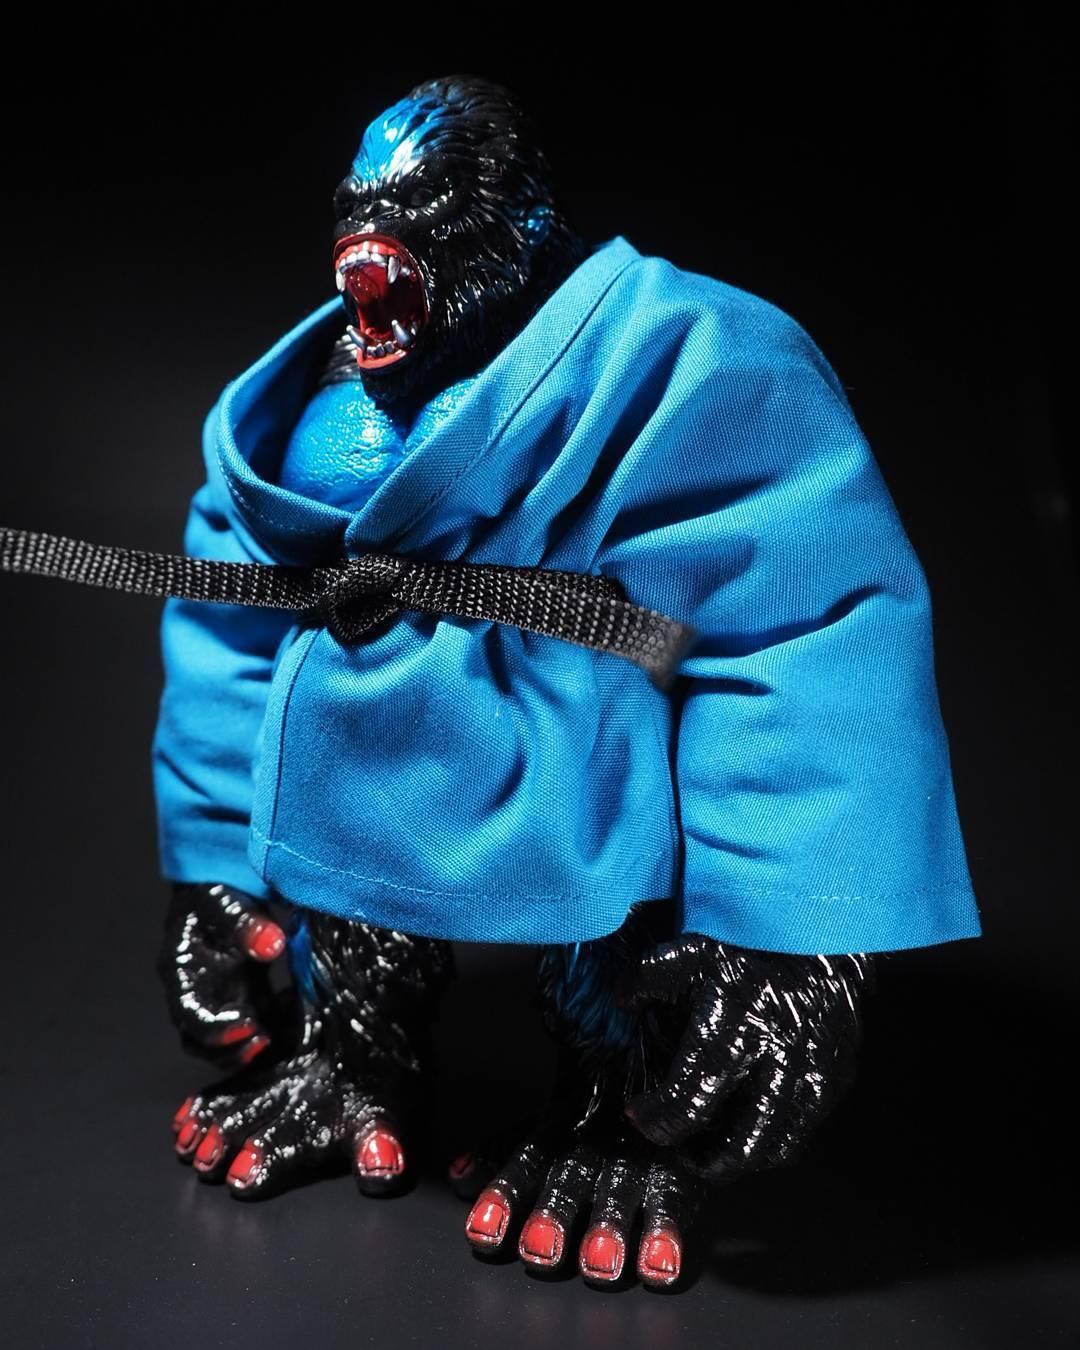 Planet-X Asia Vintage & Vinyl Club Goliathon Kaiju Vinyl Figure Gorilla